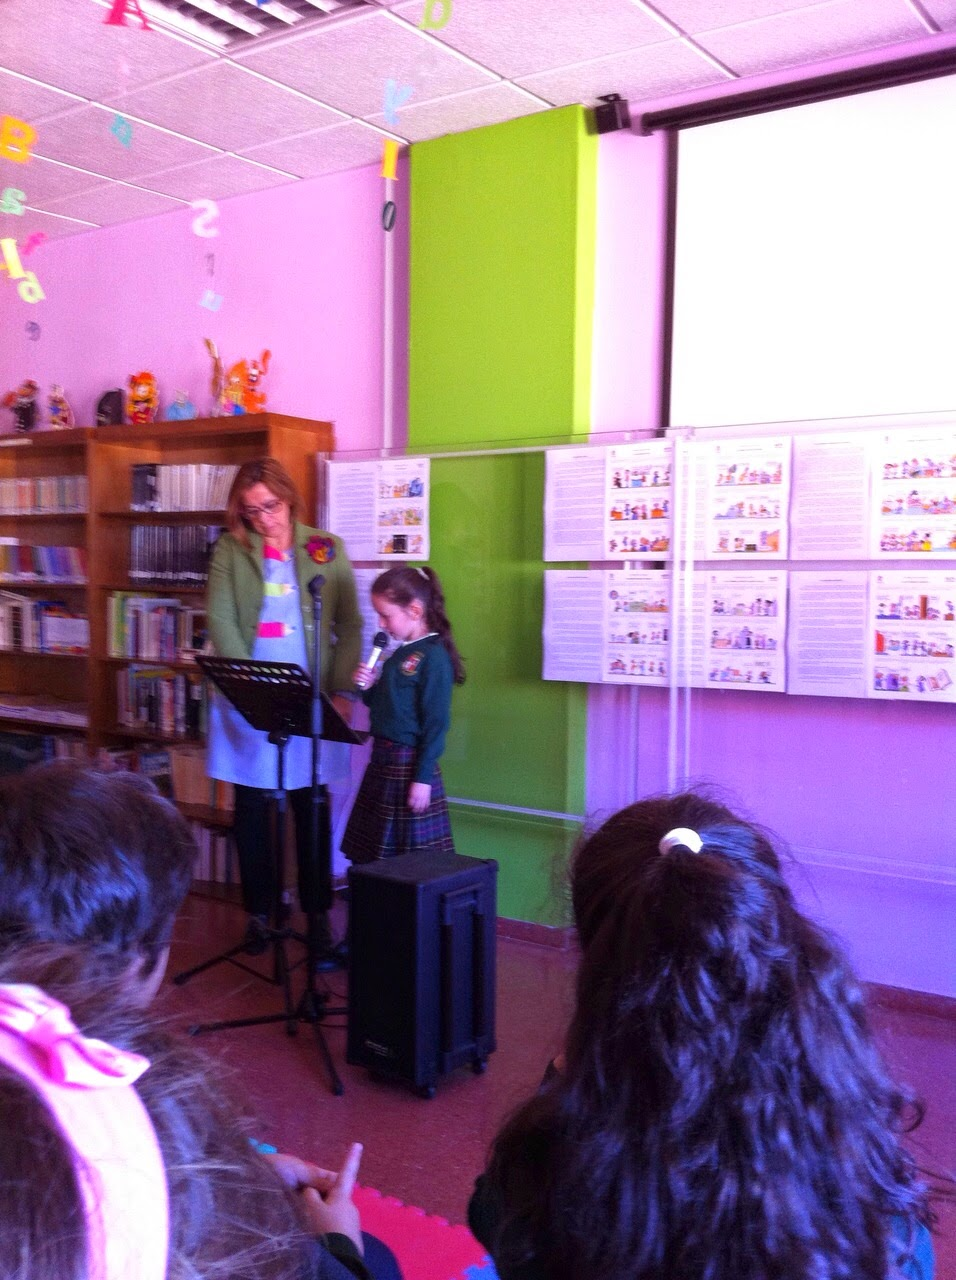 Biblioteca Escolar María Auxiliadora Cáceres: mayo 2015